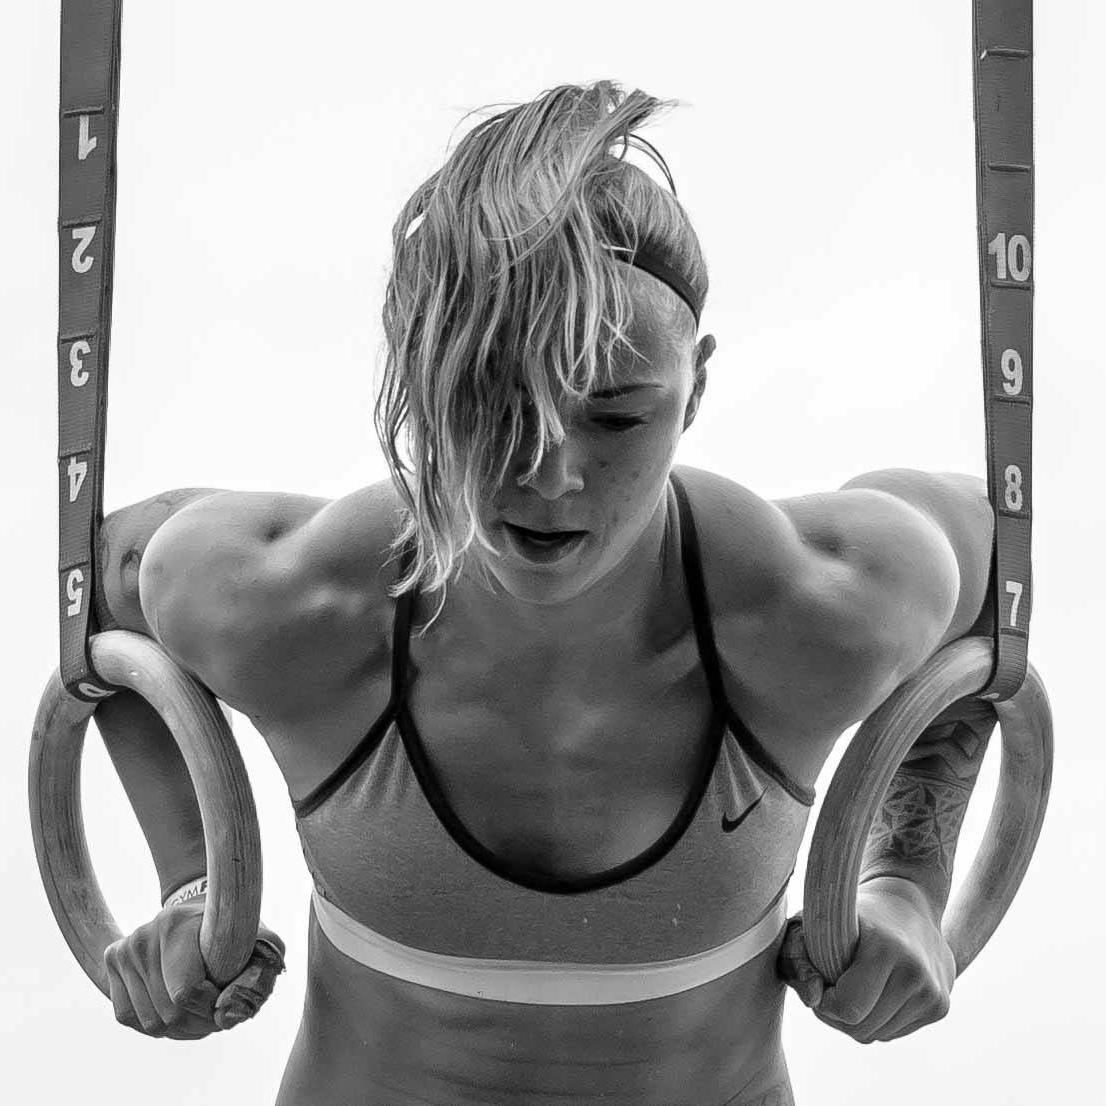 Vanessa Wagner